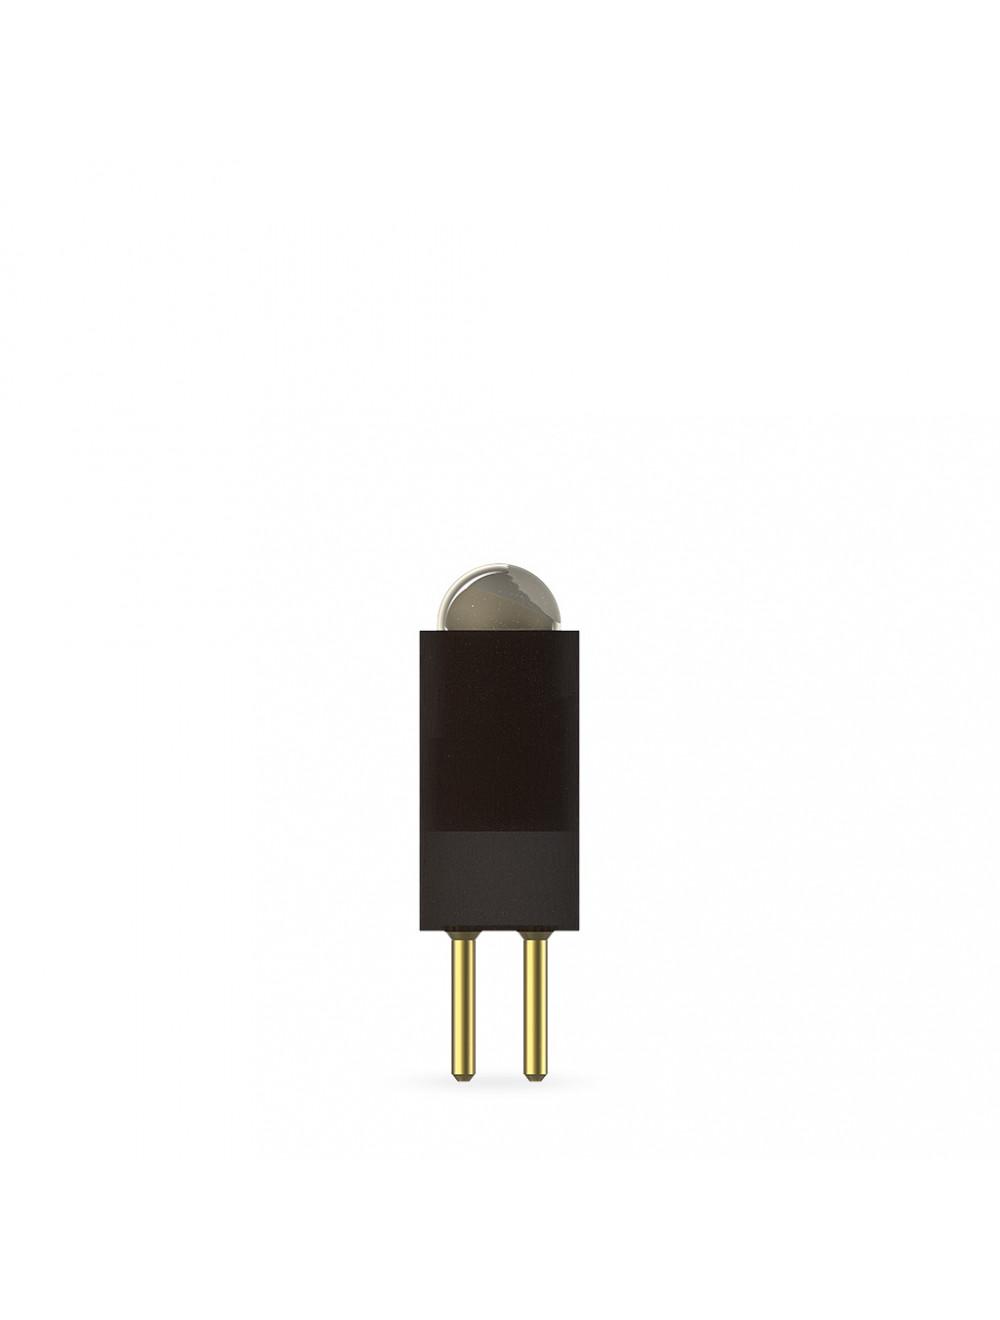 Das Produkt MK-dent Xenon Lampe BU7012BA aus dem Global-dent online shop.